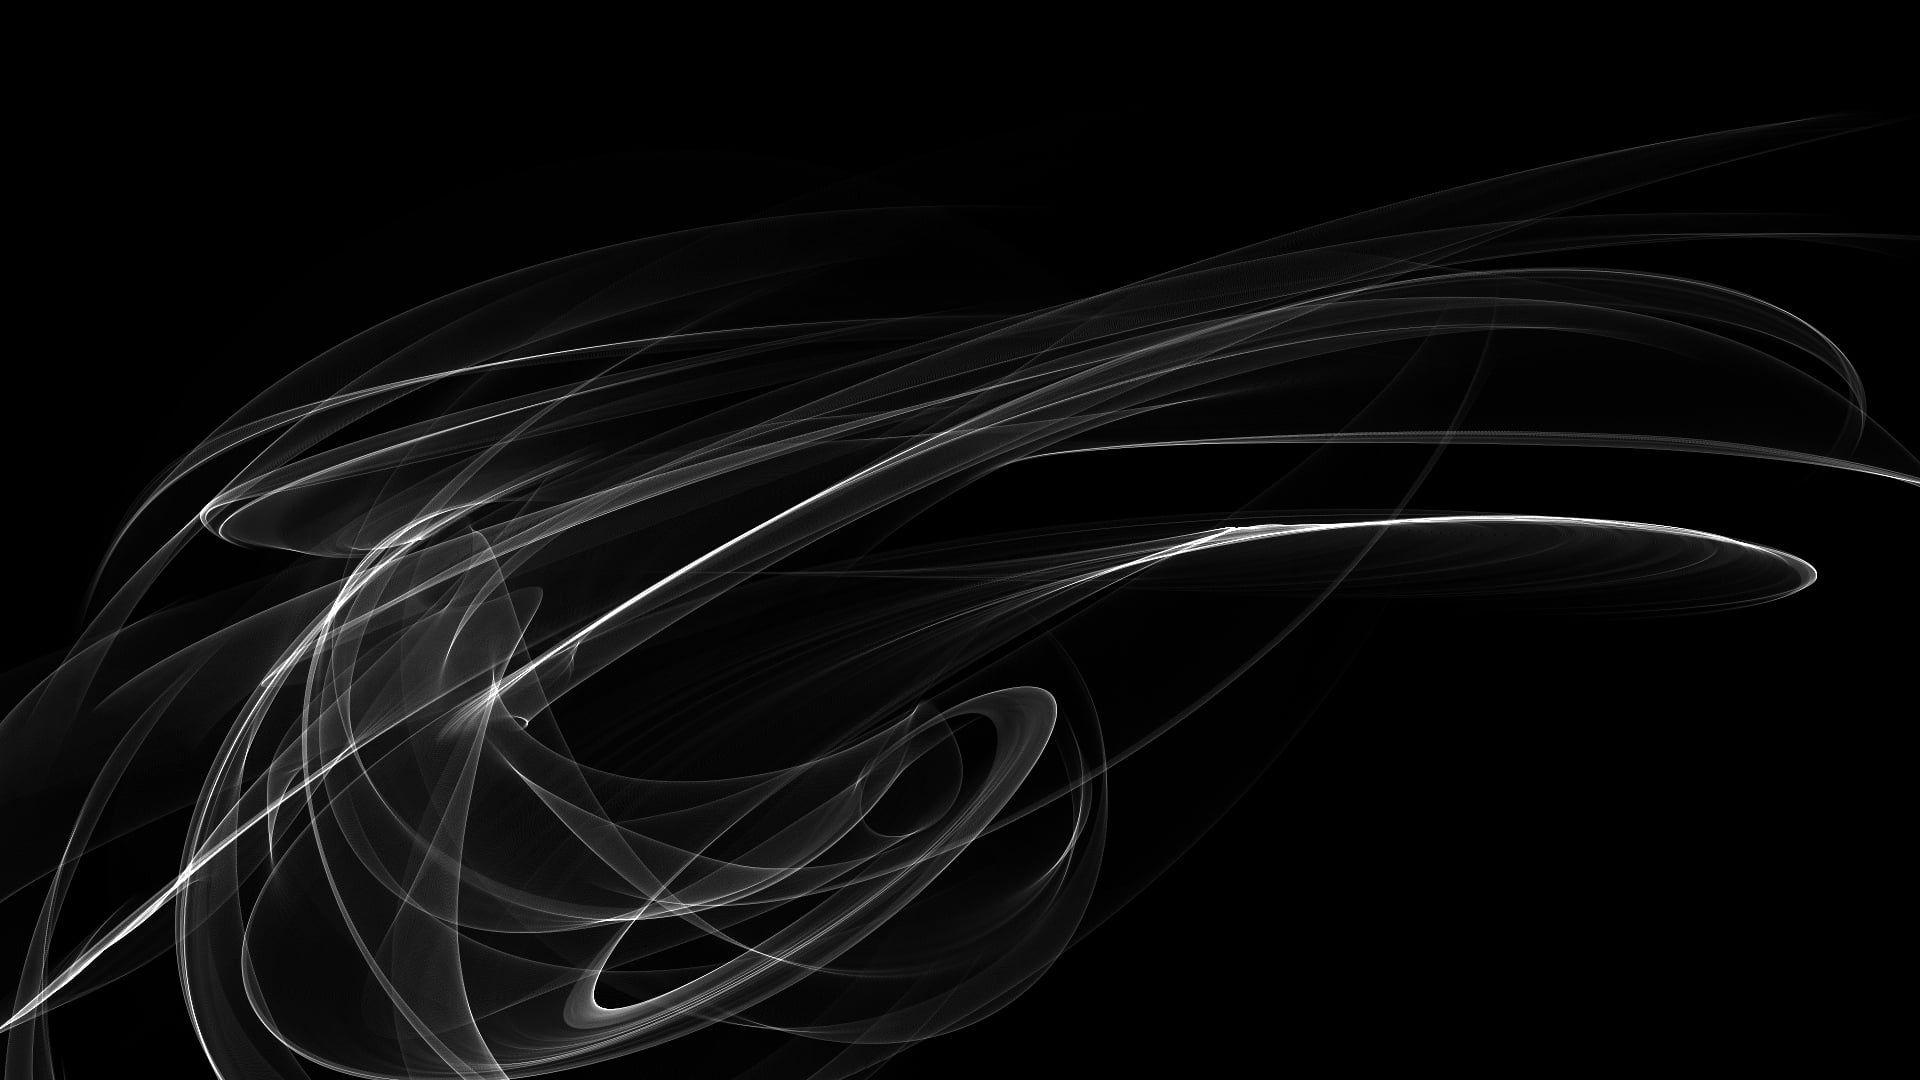 Line Background Dark 1080p Wallpaper Hdwallpaper Desktop